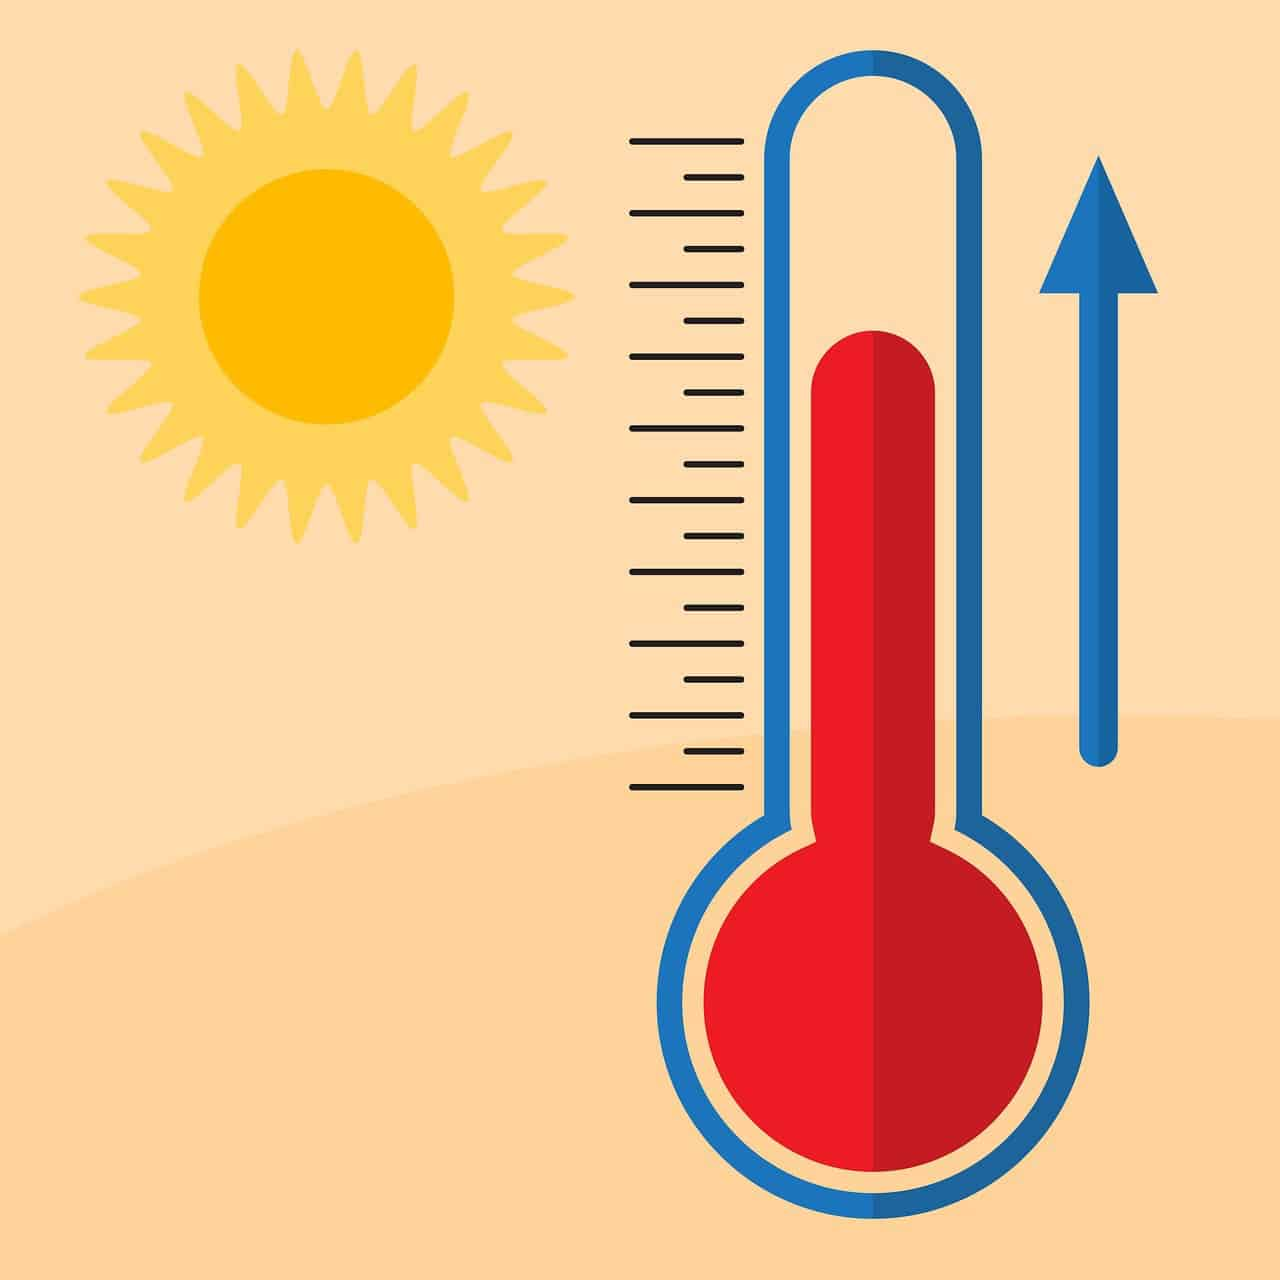 summer 6125976 1280 - CALDO AFRICANO dal weekend, prime prove d'estate. Le temperature previste